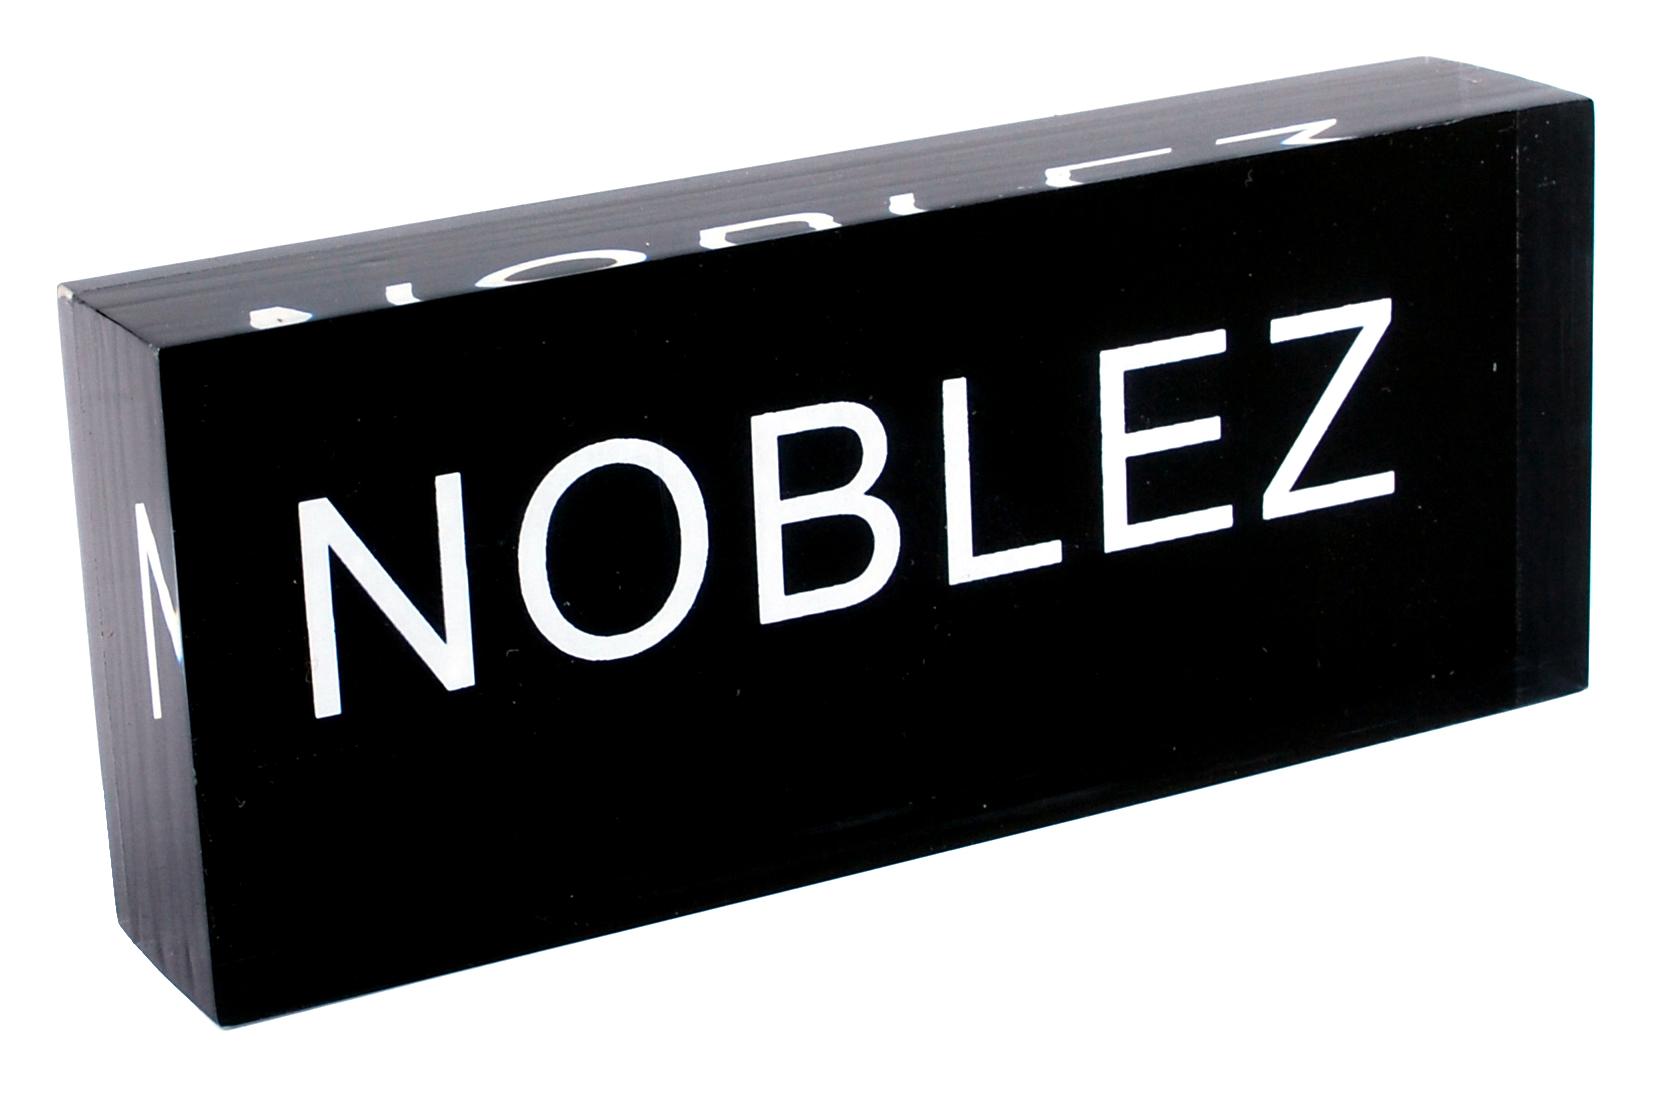 NOBLEZBlock